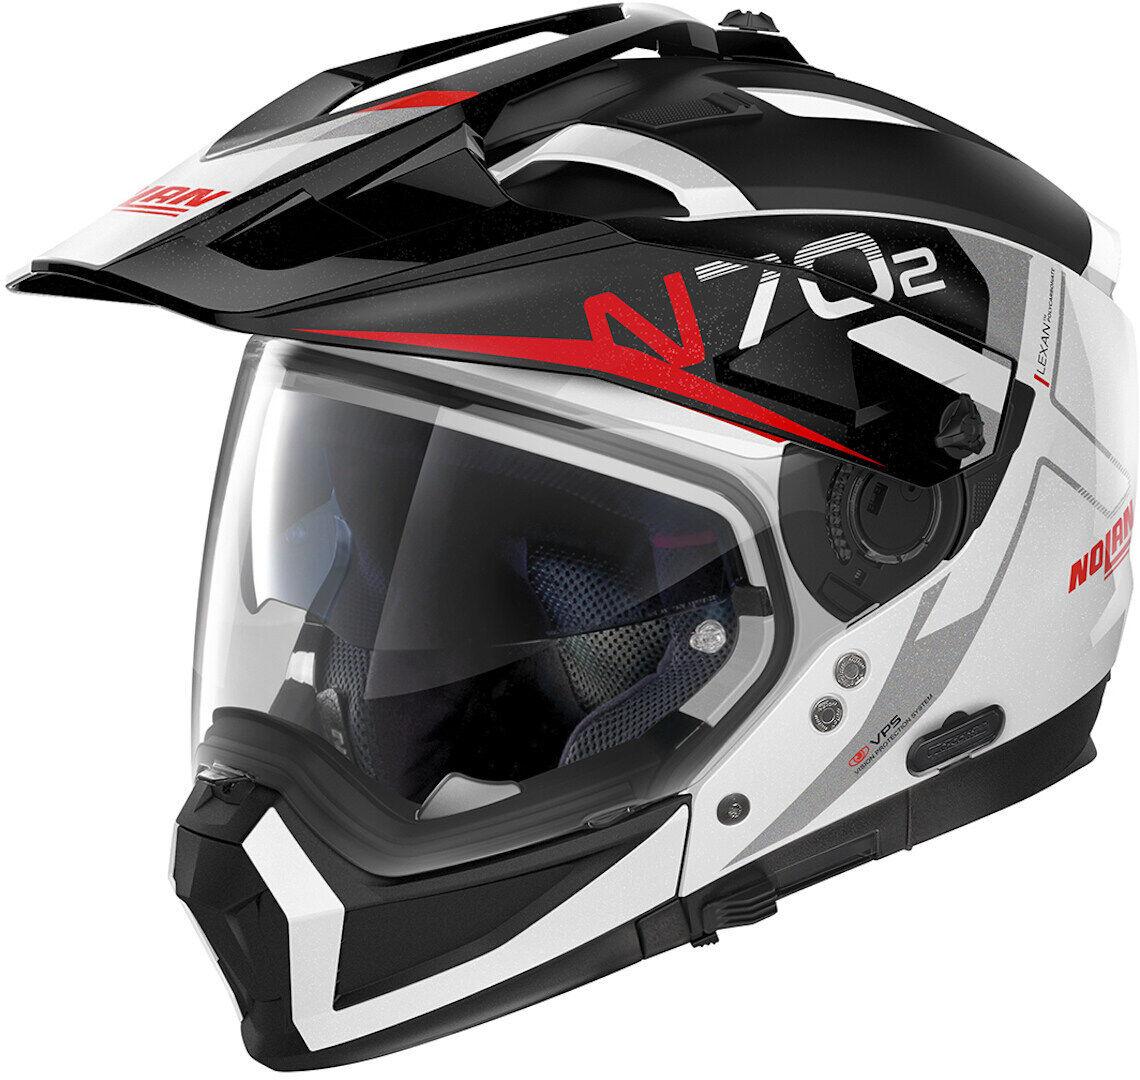 Nolan N70-2 X Bungee N-Com Helmet  - Black White - Size: XL